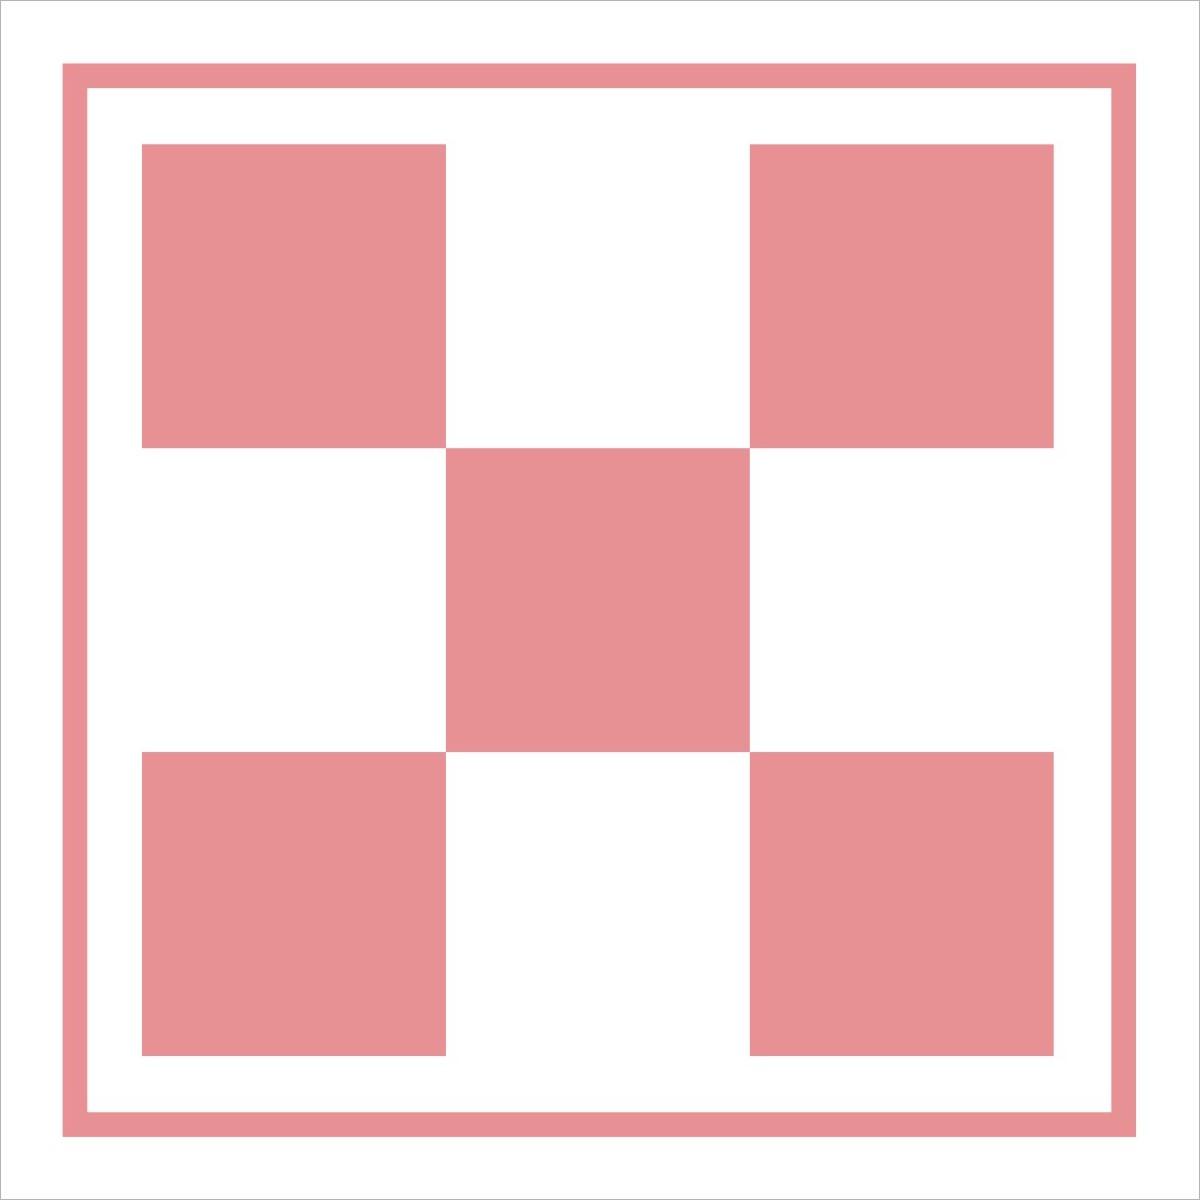 Purina DentaLife Small/Medium Dog Daily Dental Chews (2 47-count pouches)